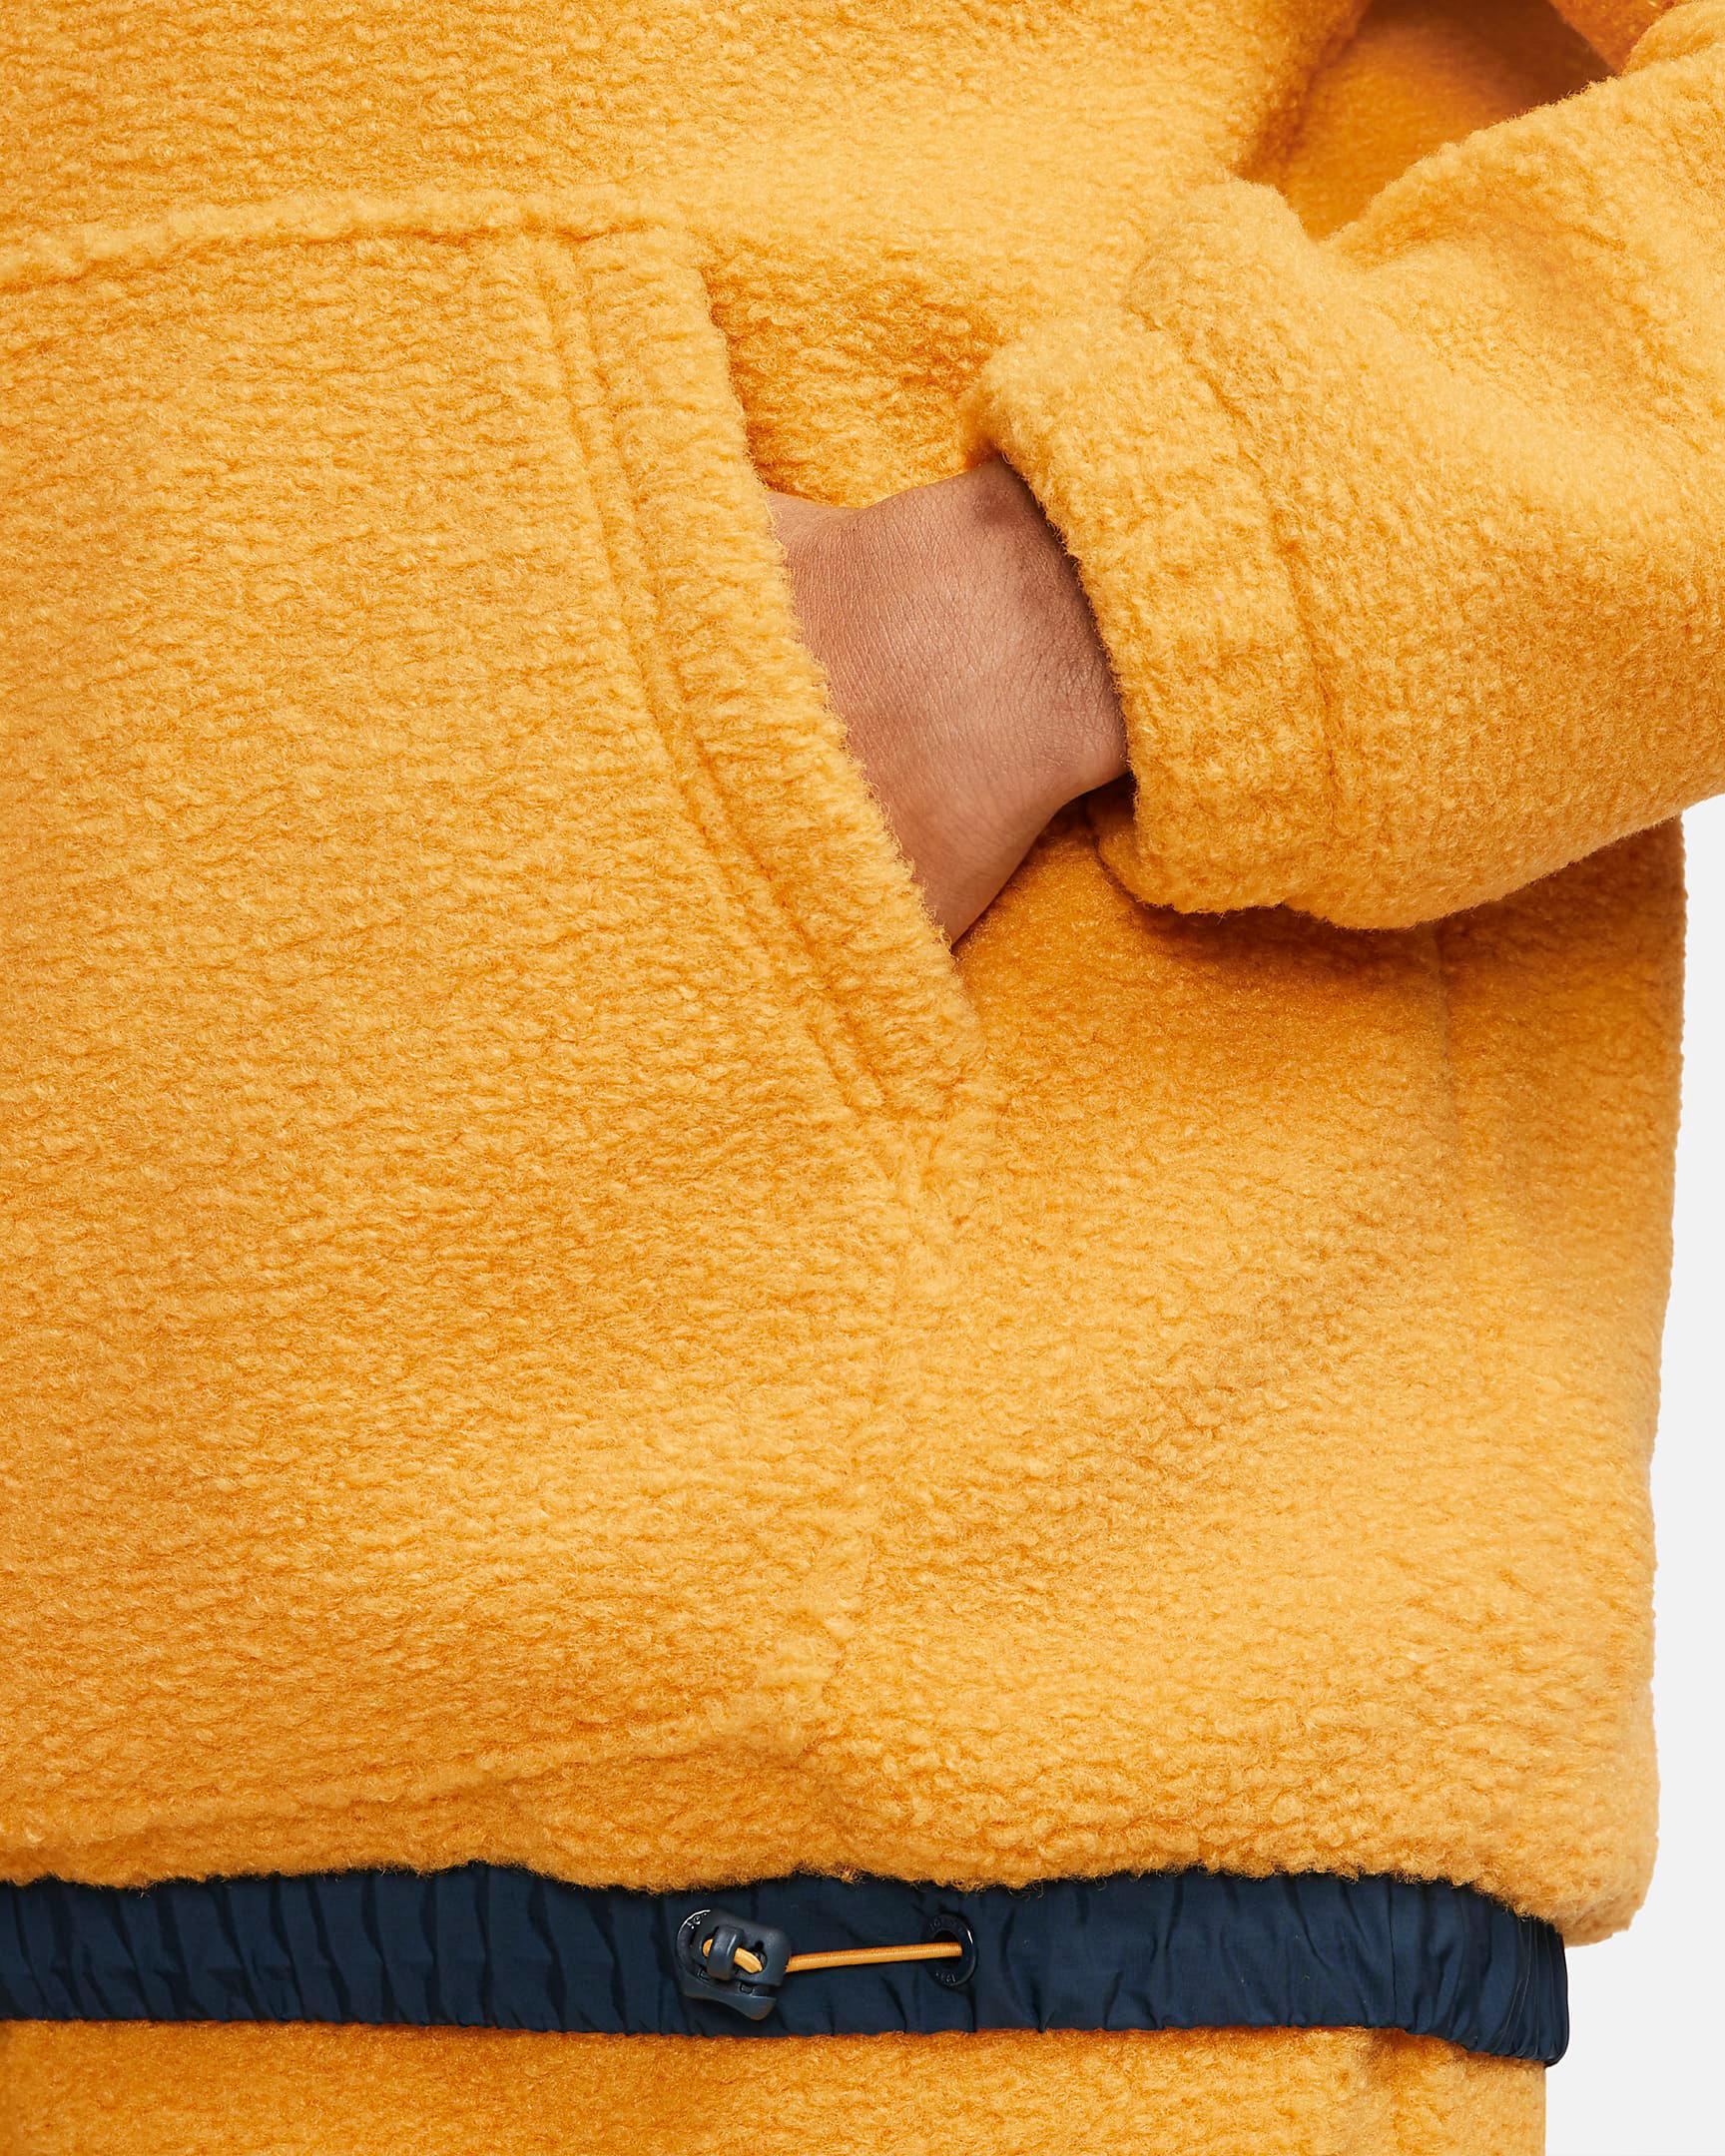 jordan-pollen-essentials-mountainside-hoodie-4